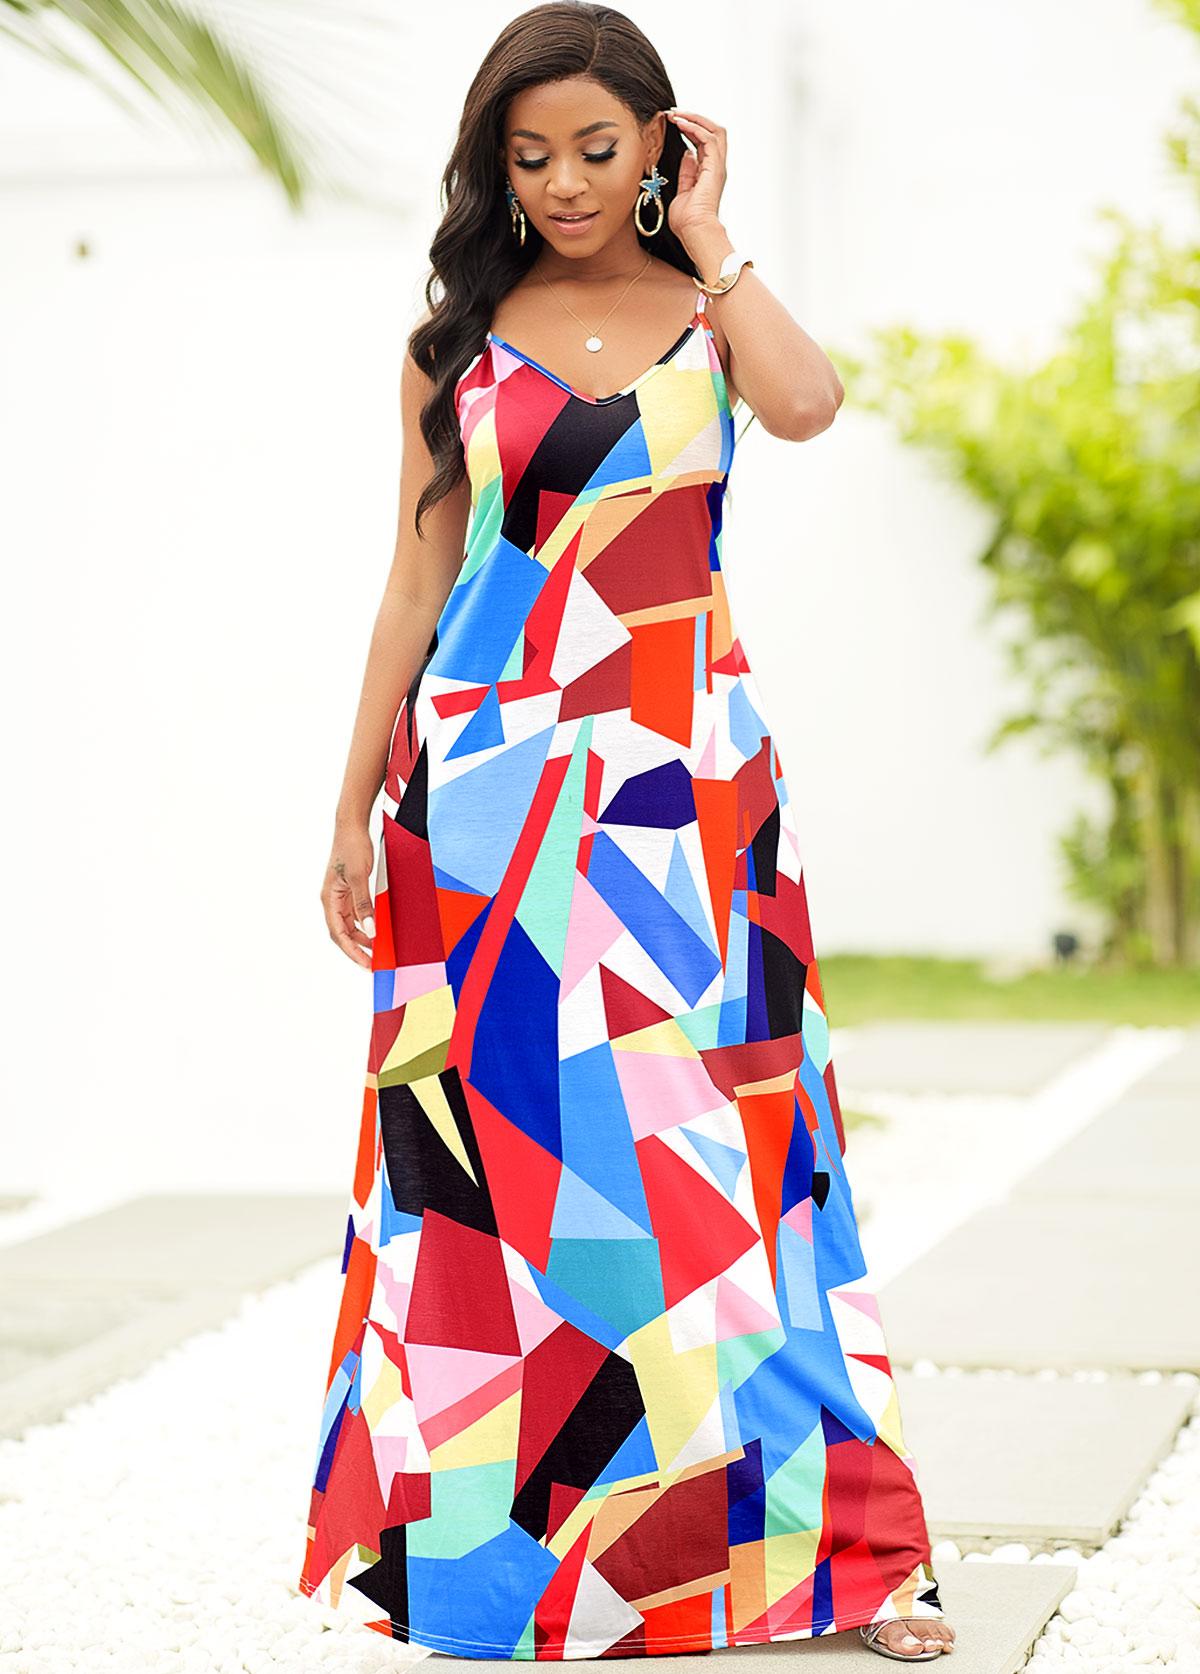 Spaghetti Strap Geometric Print Pocket Dress